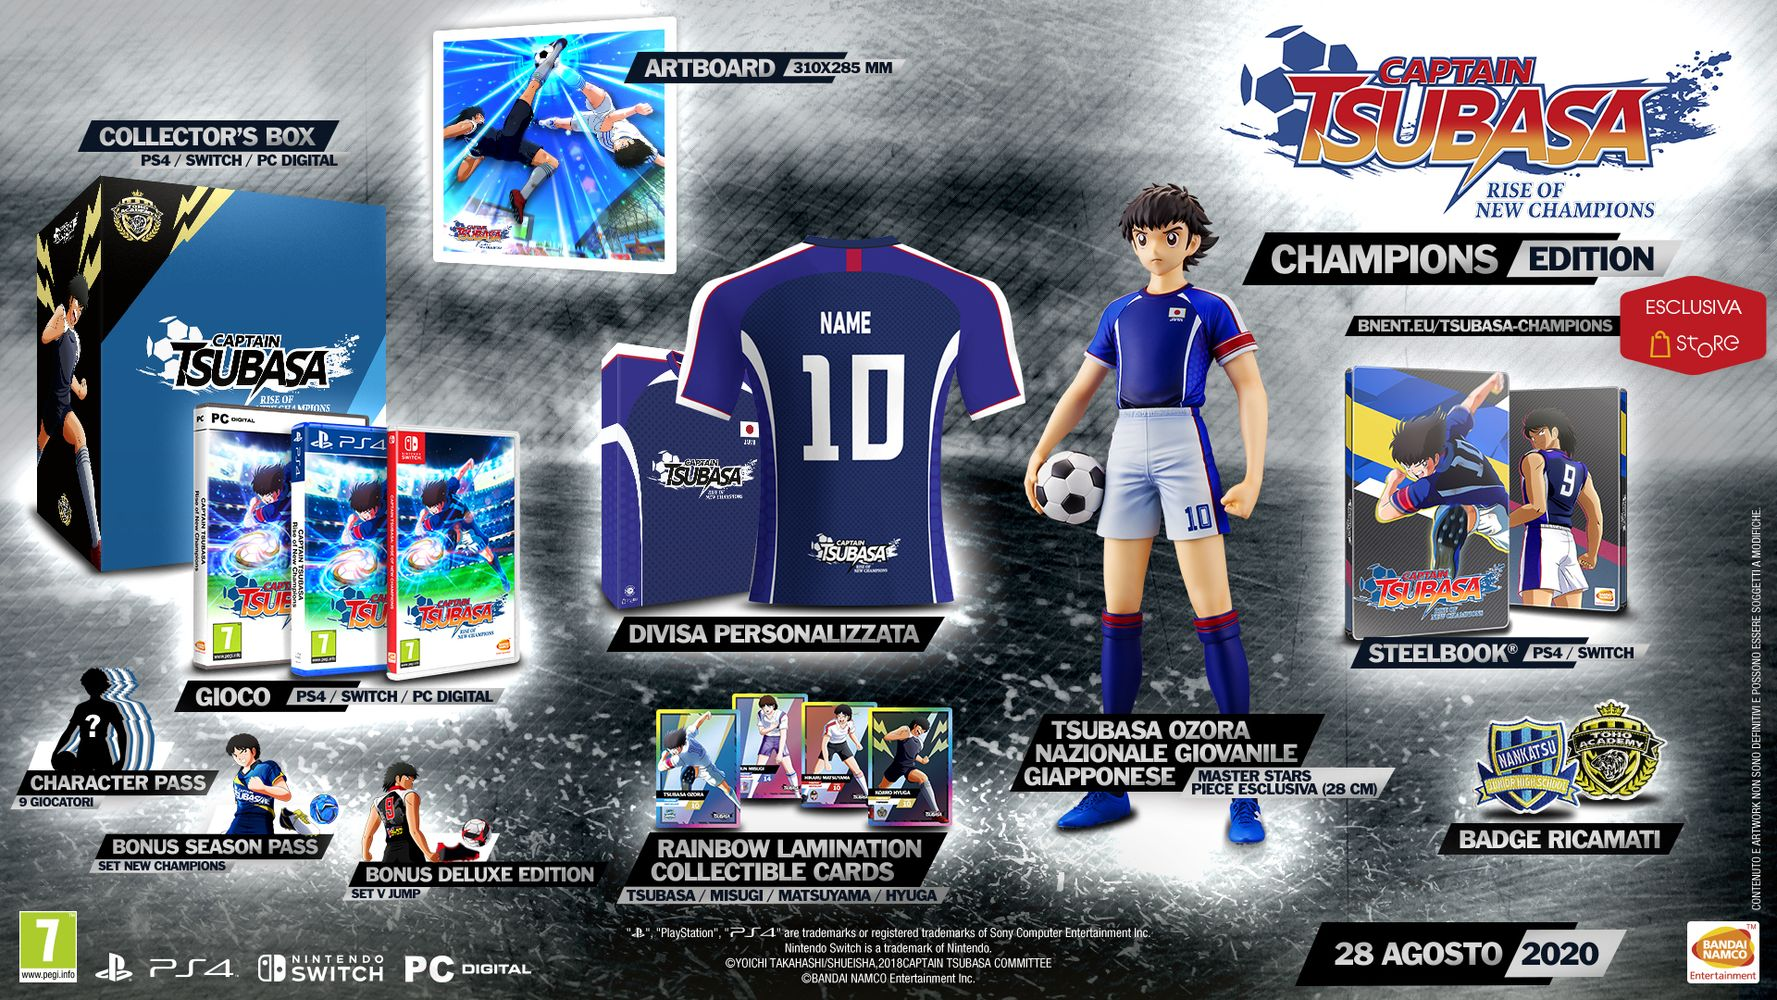 Champions Edition - Captain Tsubasa: Rise of New Champions